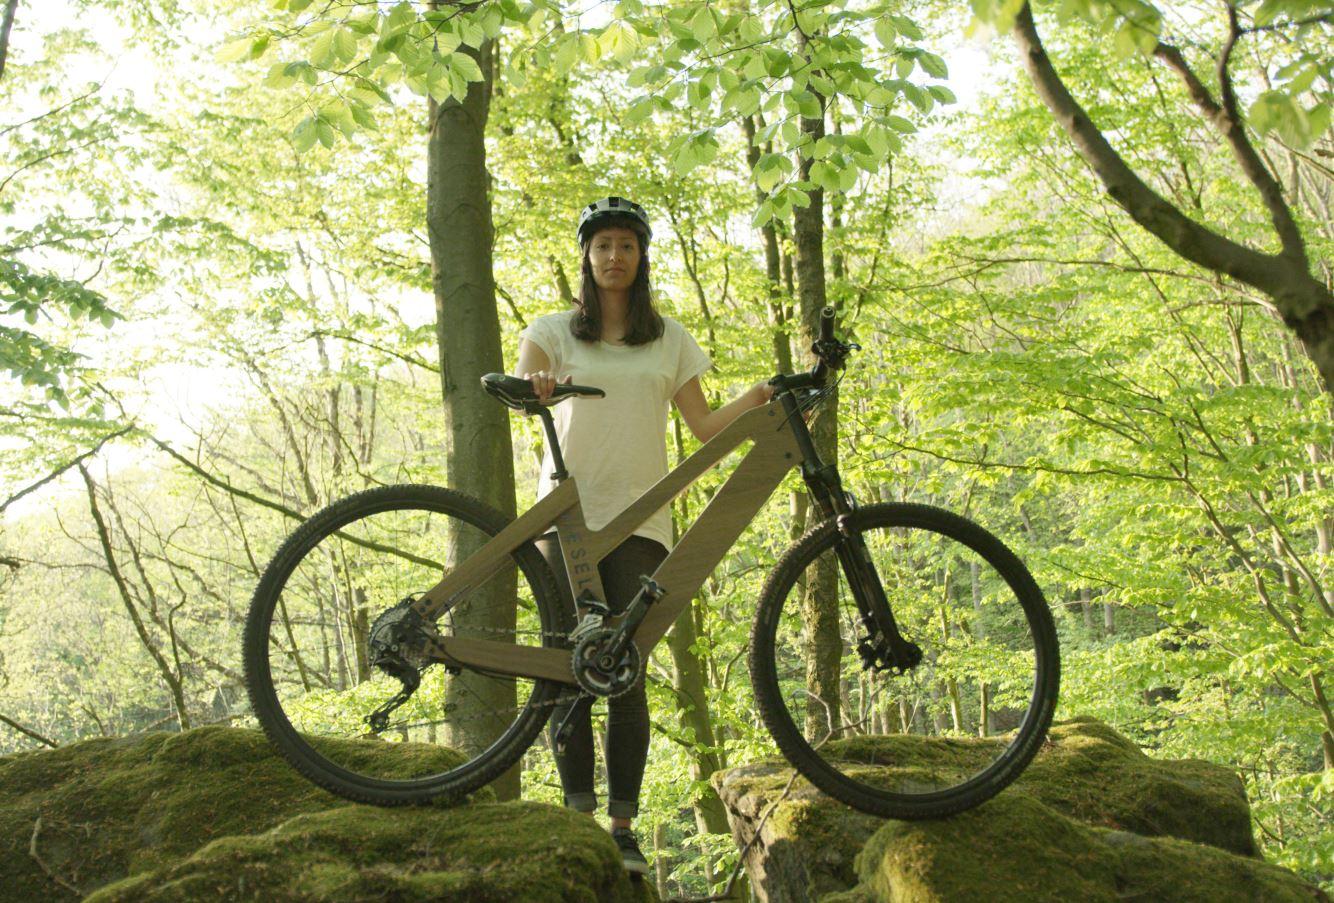 myesel fahrad - My Esel Fahrrad